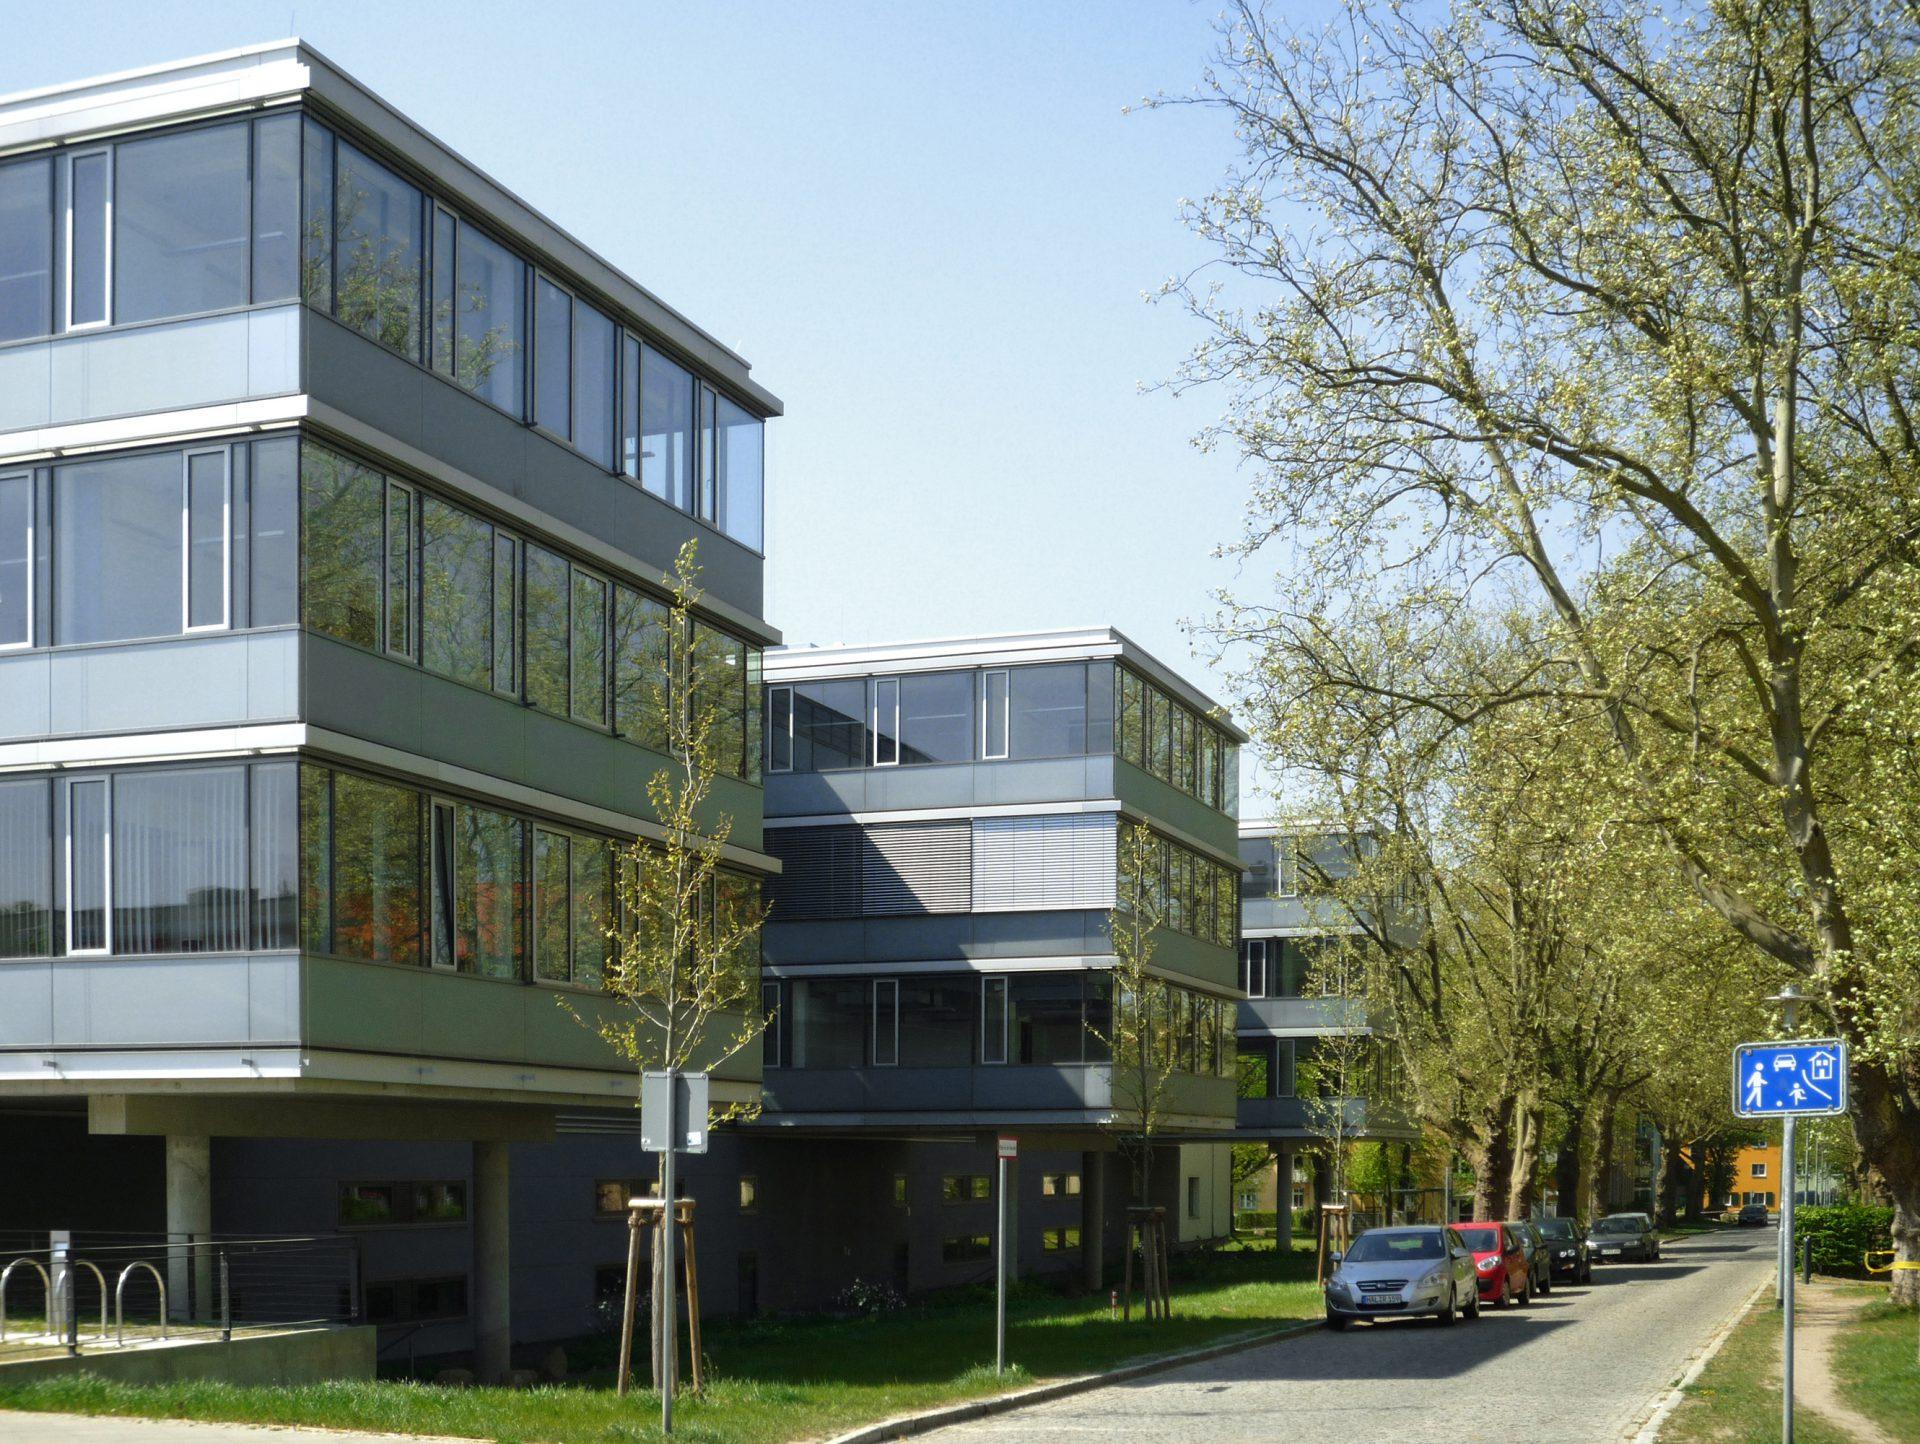 pct Gründerzentrum Potsdam